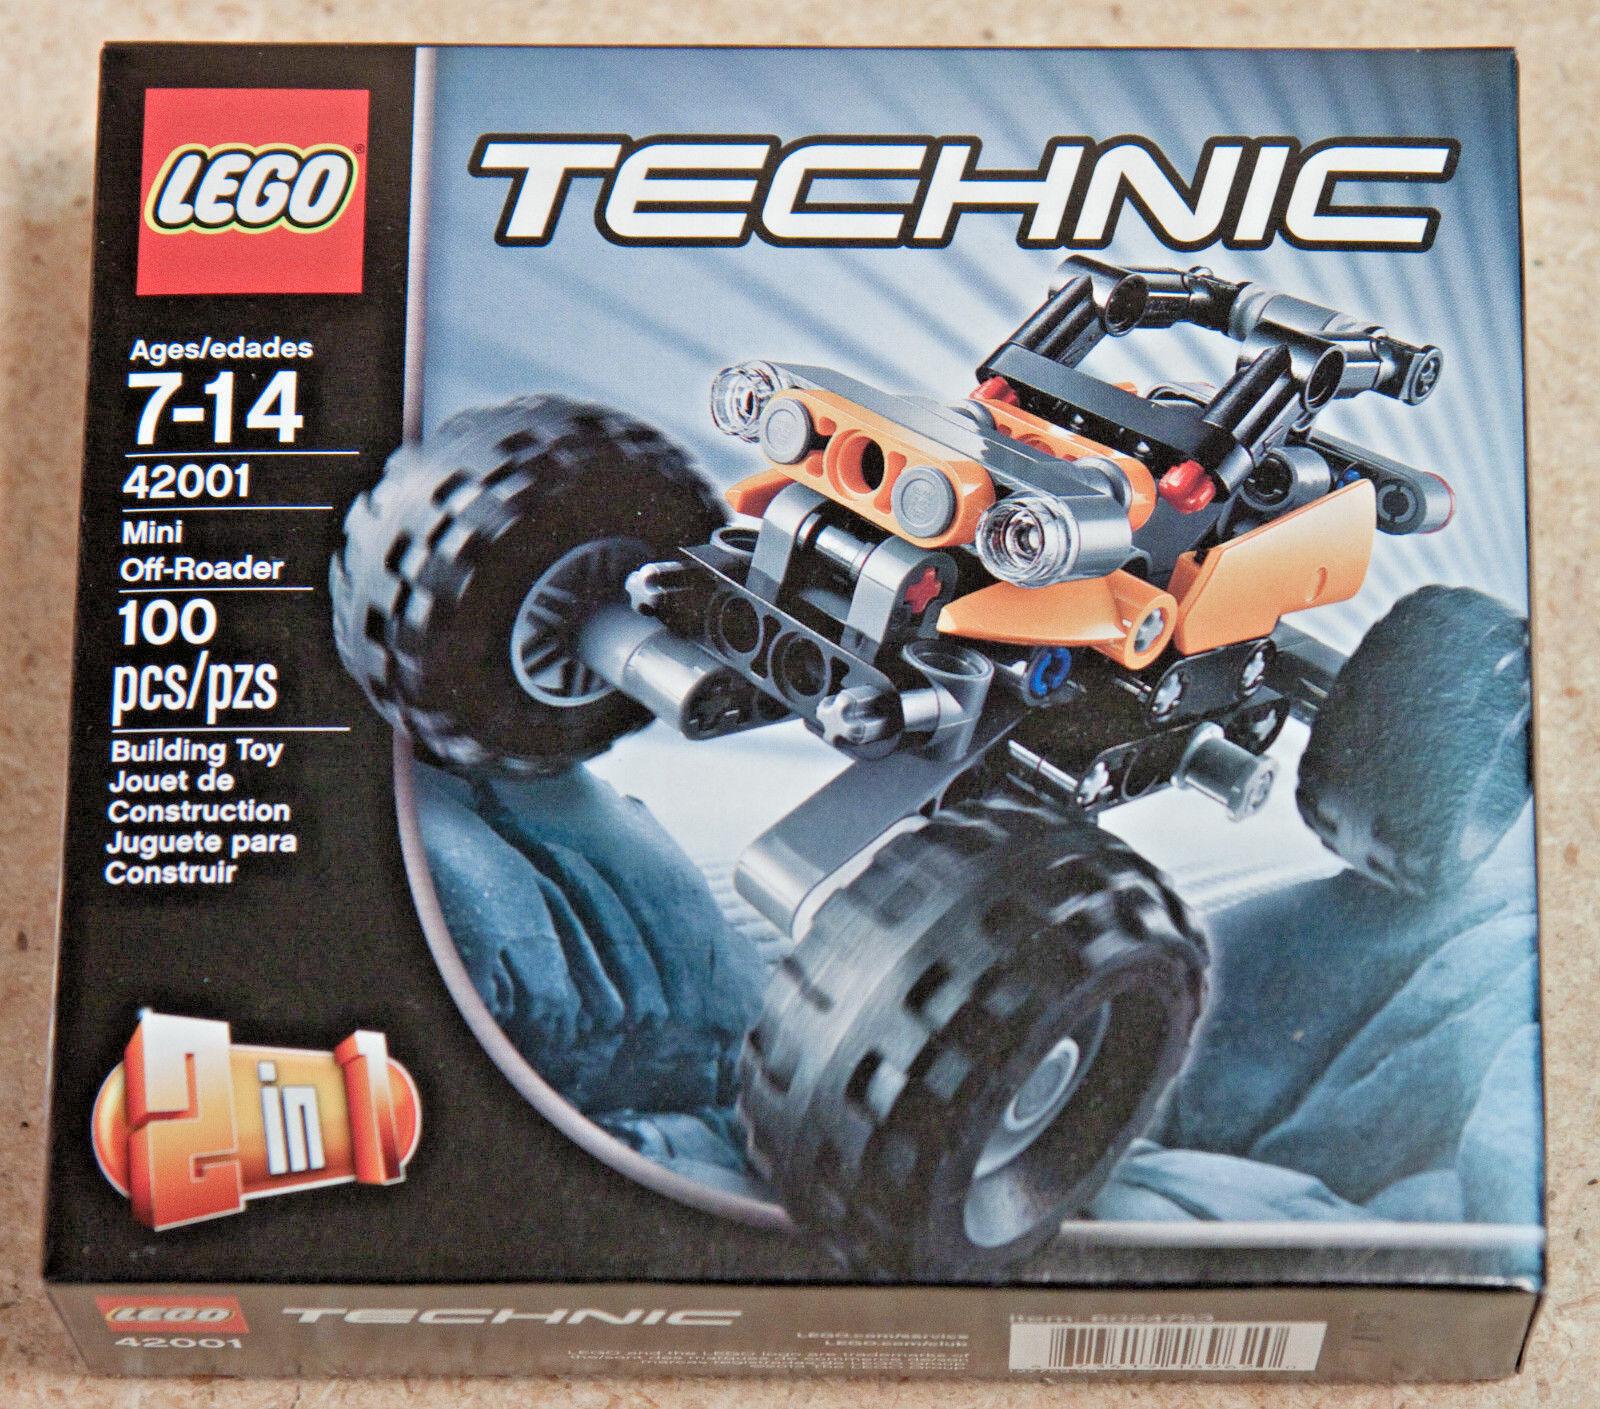 Lego Technic Mini Off Roader New Sealed Box 42001 Nqatje1811 Lego